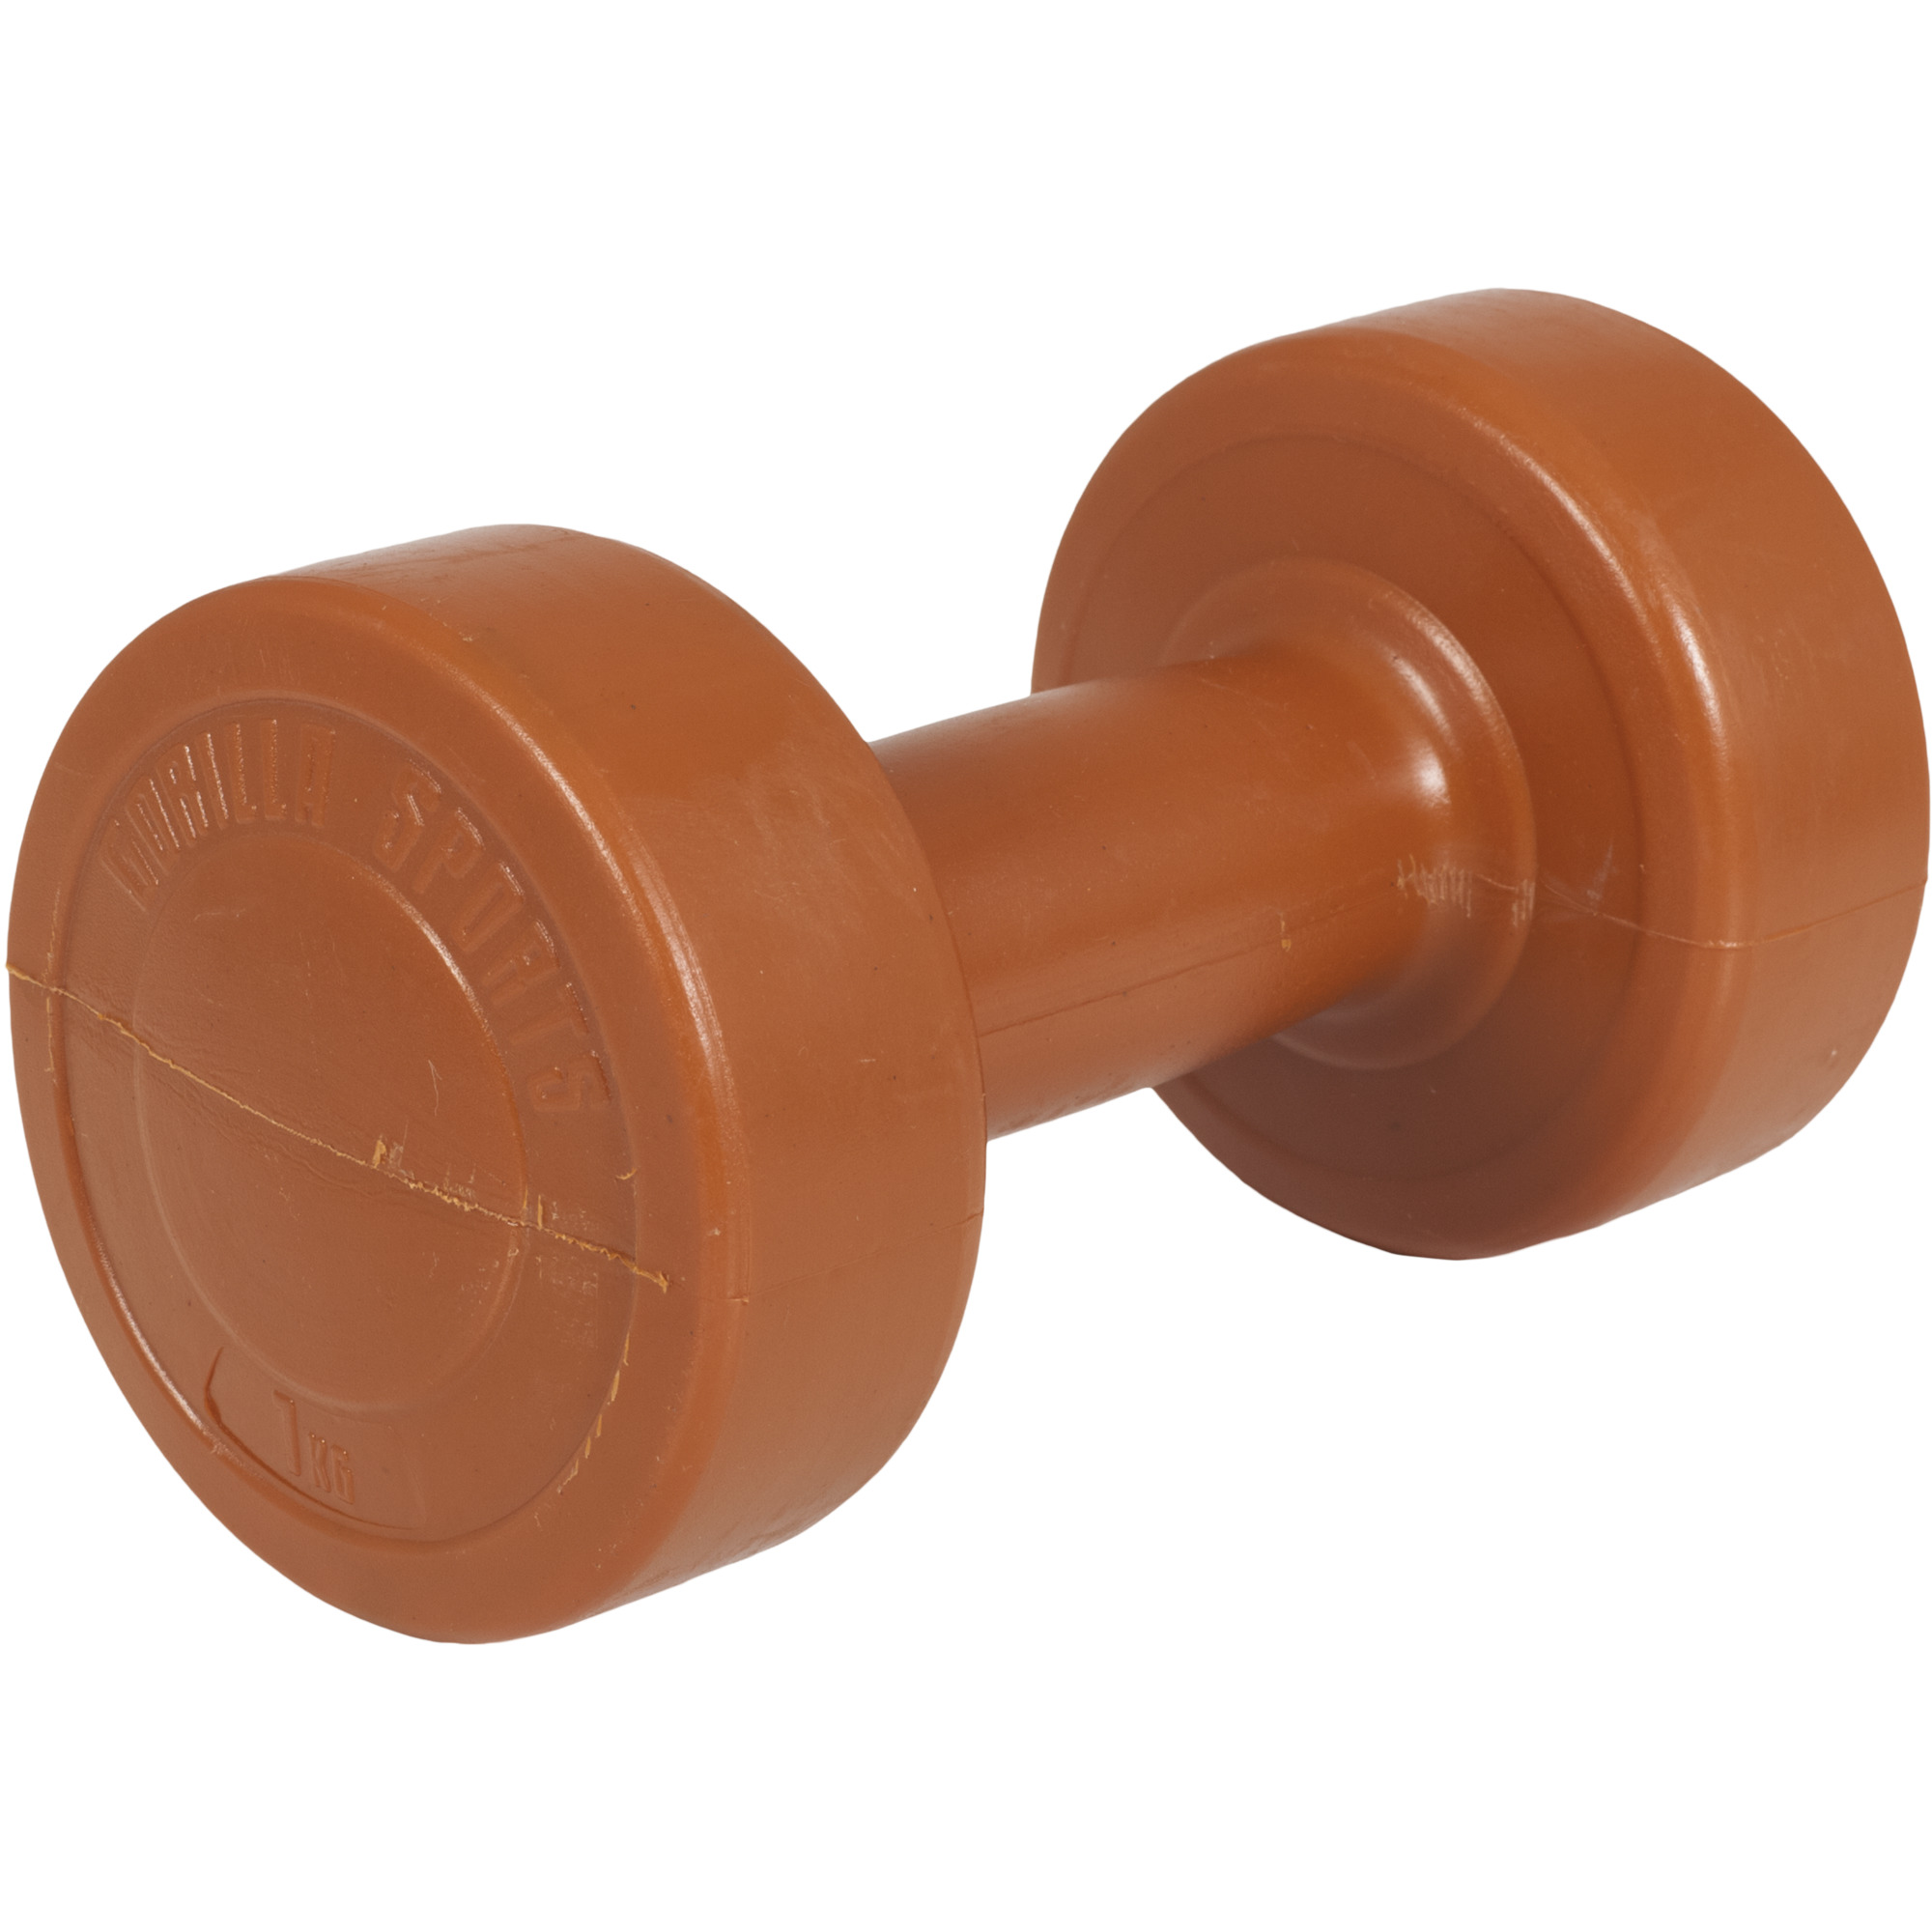 Gymnastikhantel Aerobic Kunststoff Orange 1 kg